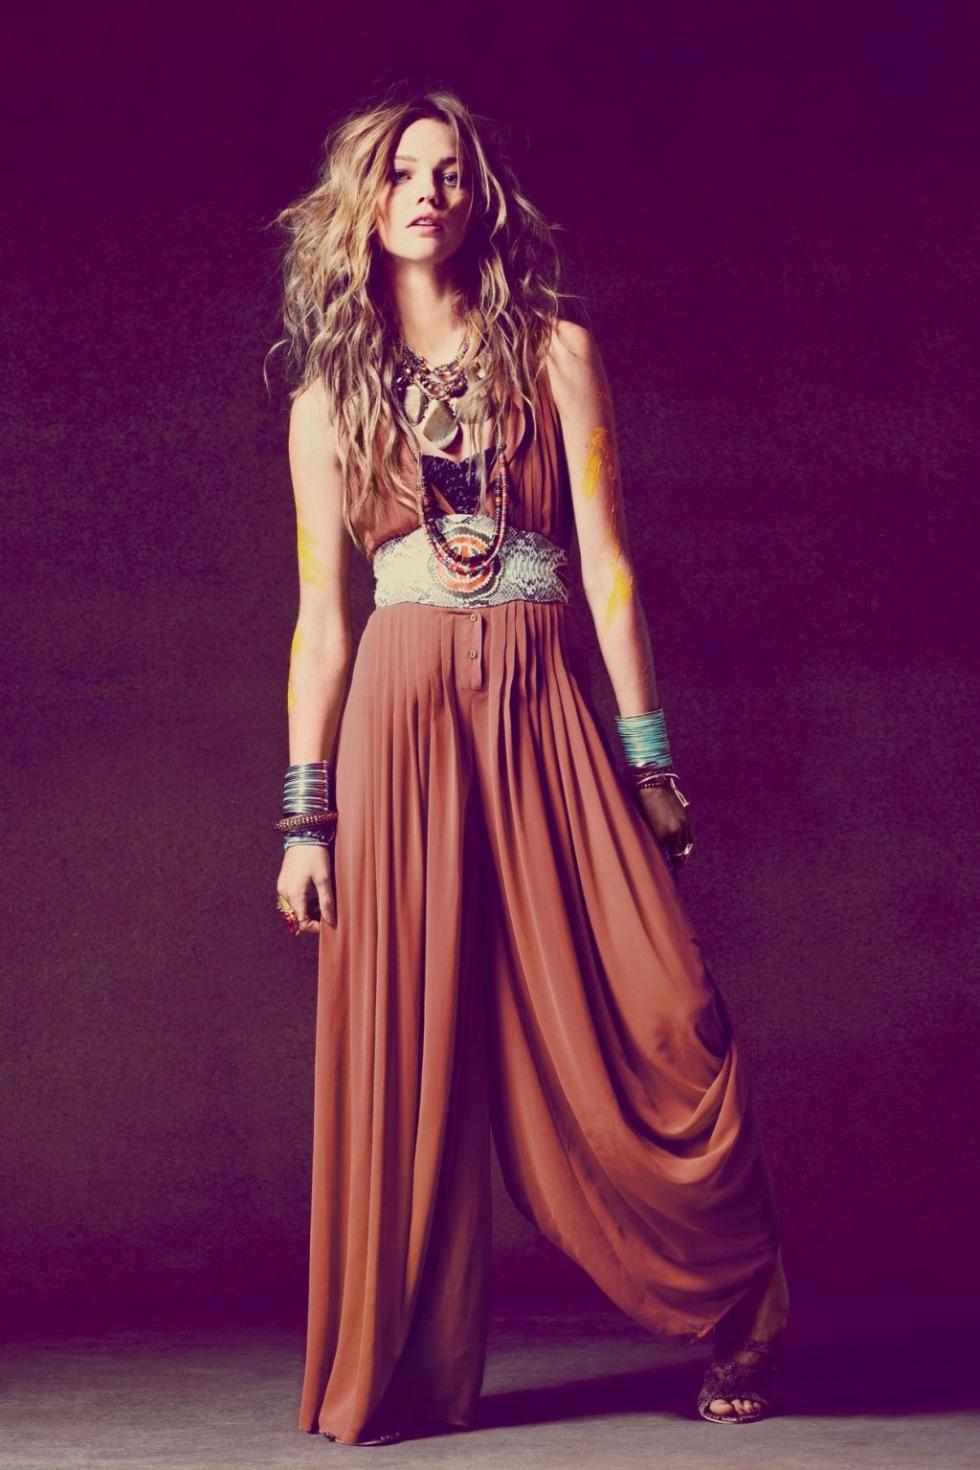 bohemian-style-dresses-10